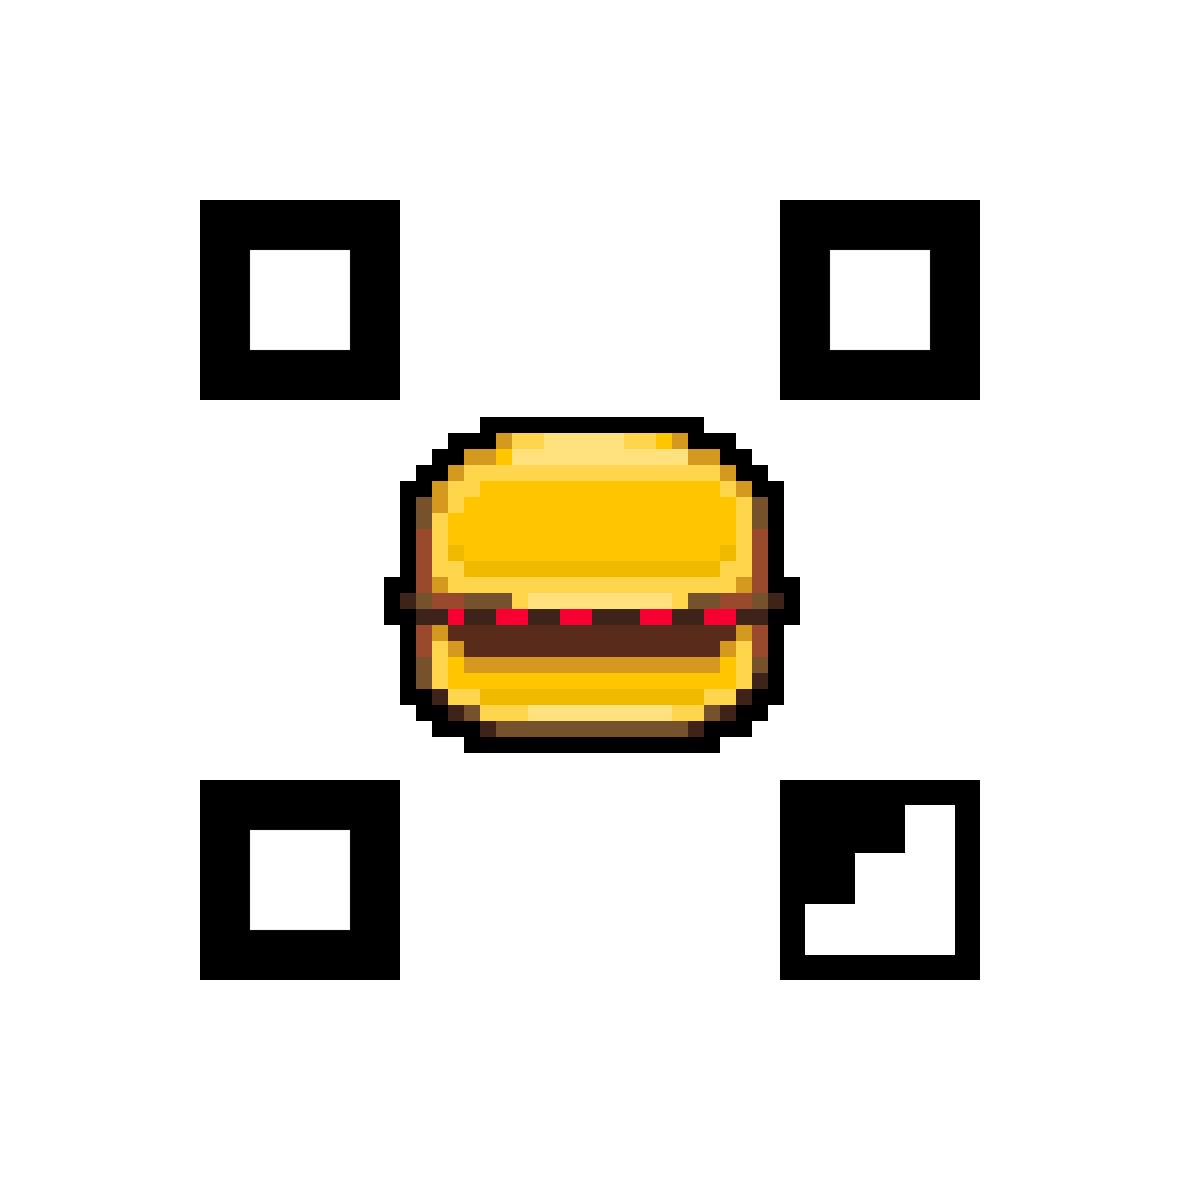 McDonalds_Hamburgercoin_getsocial_dk